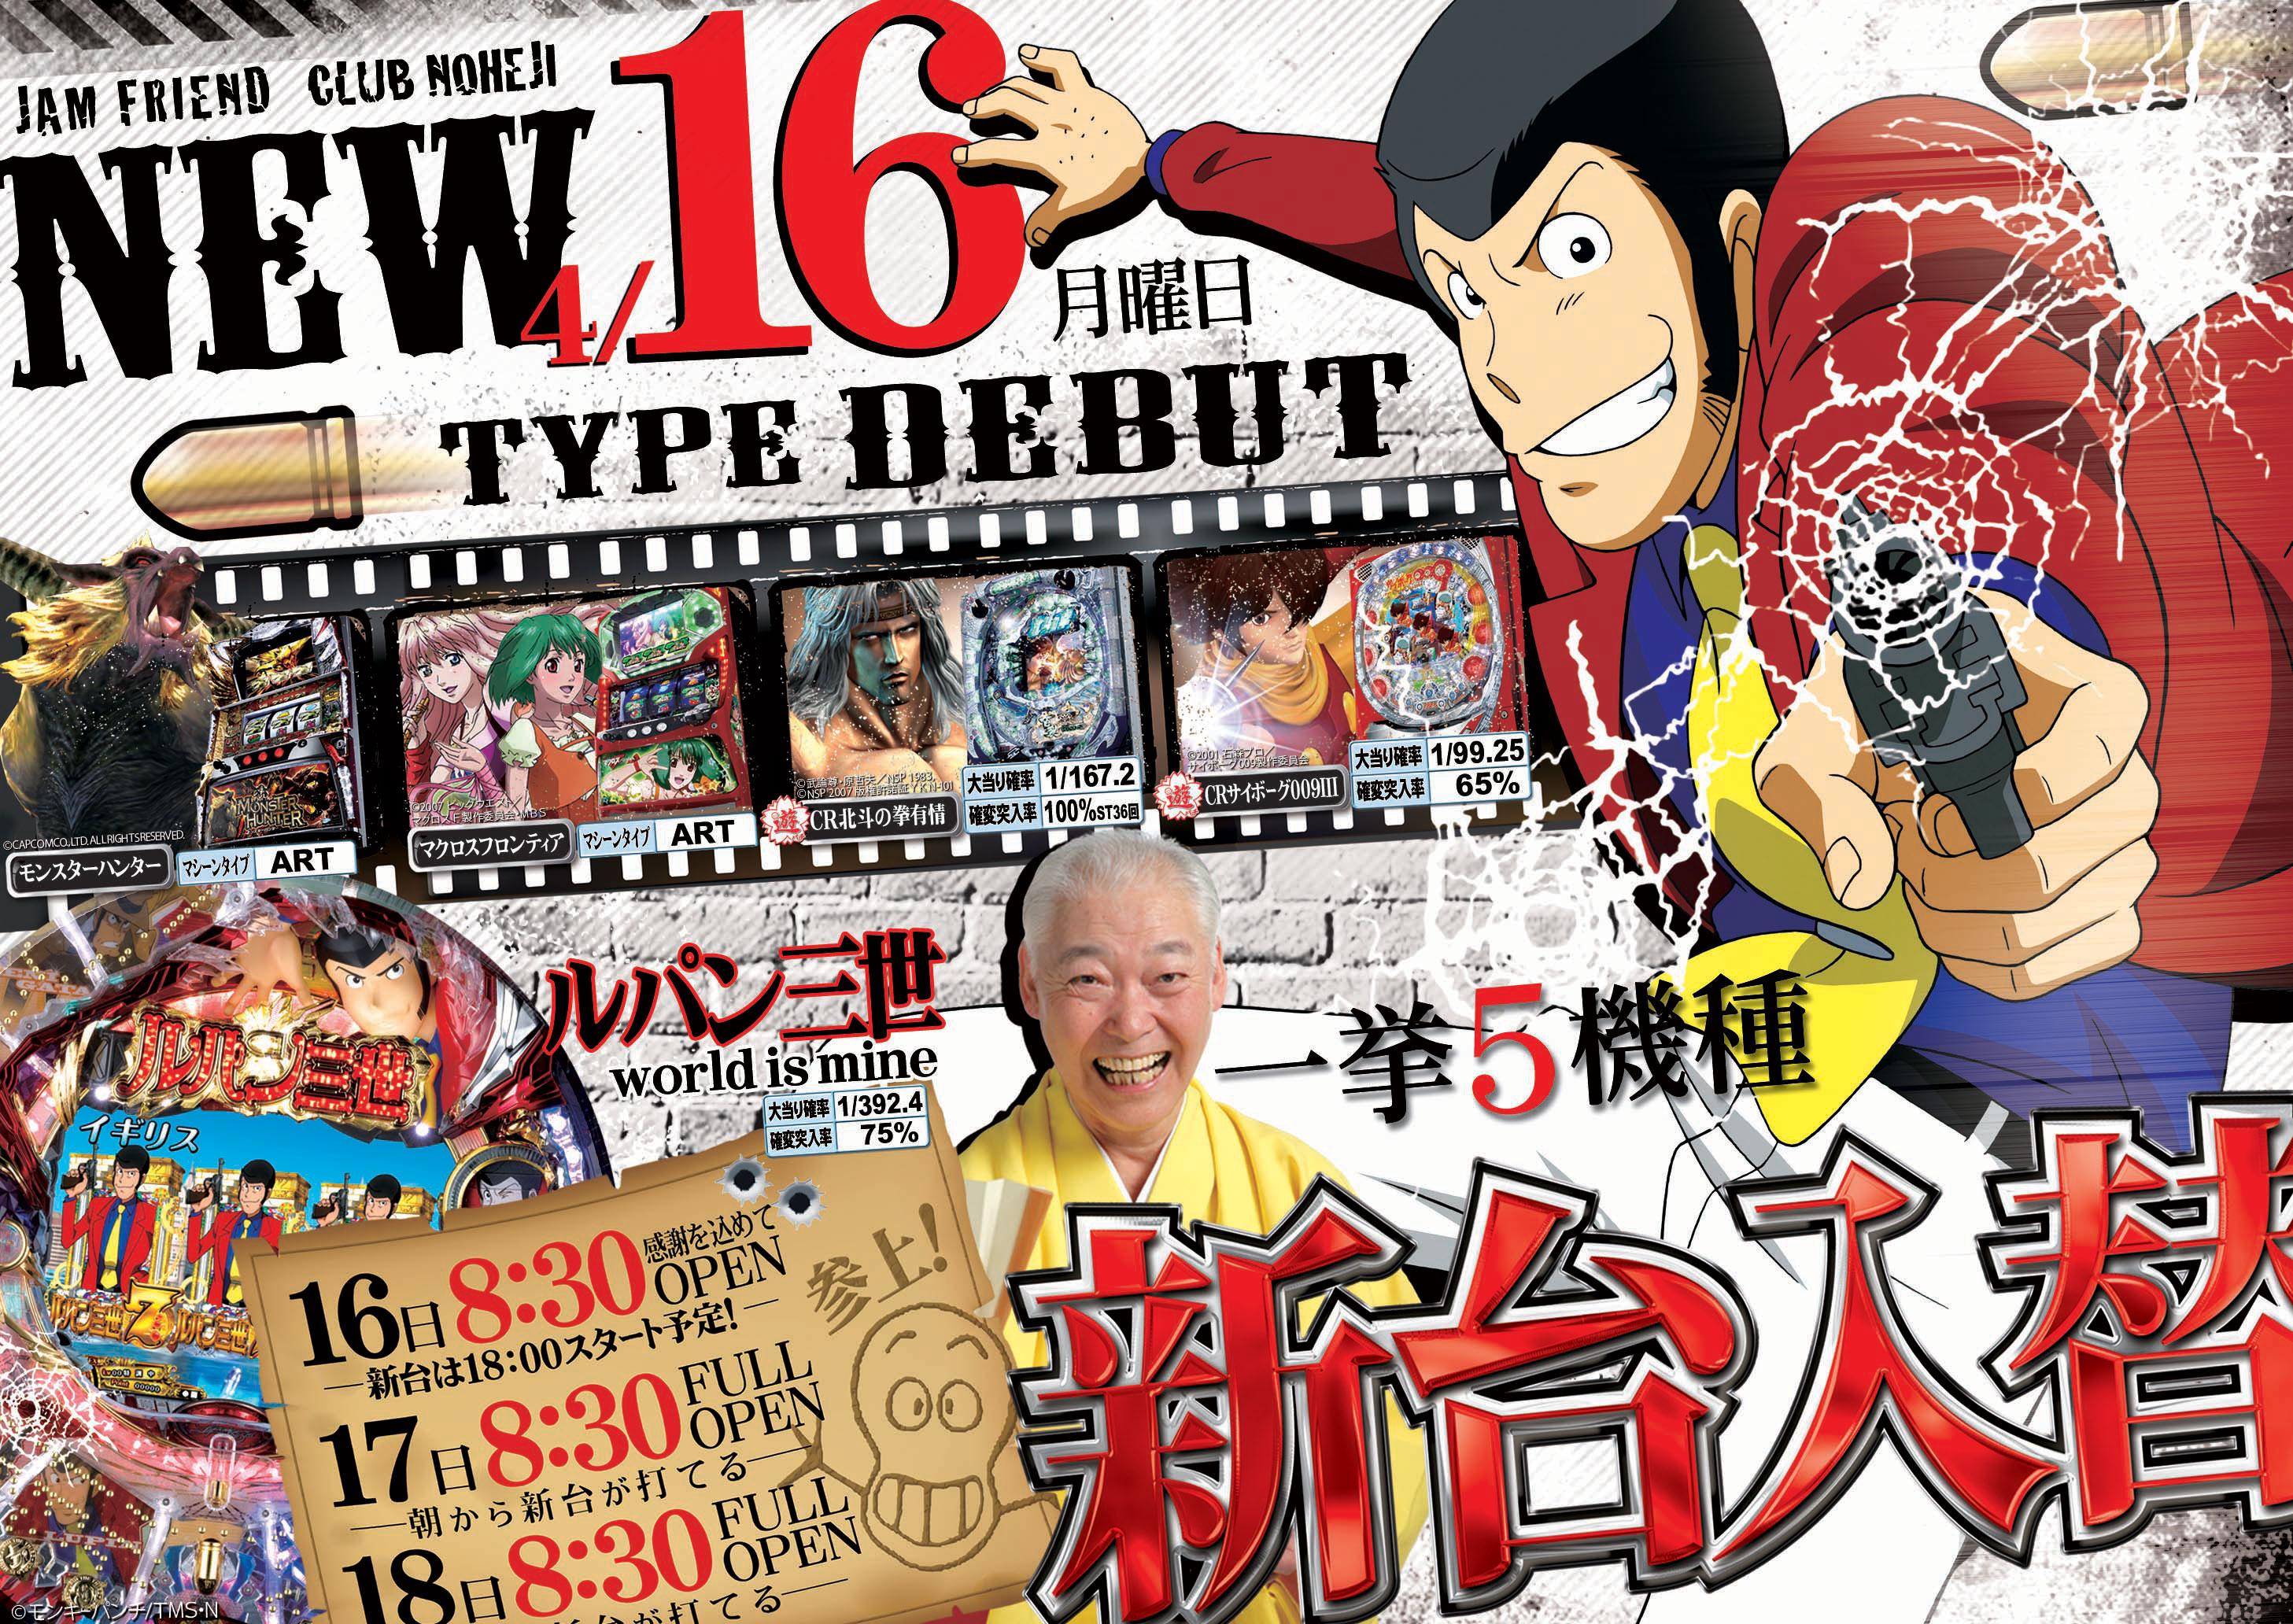 http://jam-fc.jp/information/images/0416B1.jpg